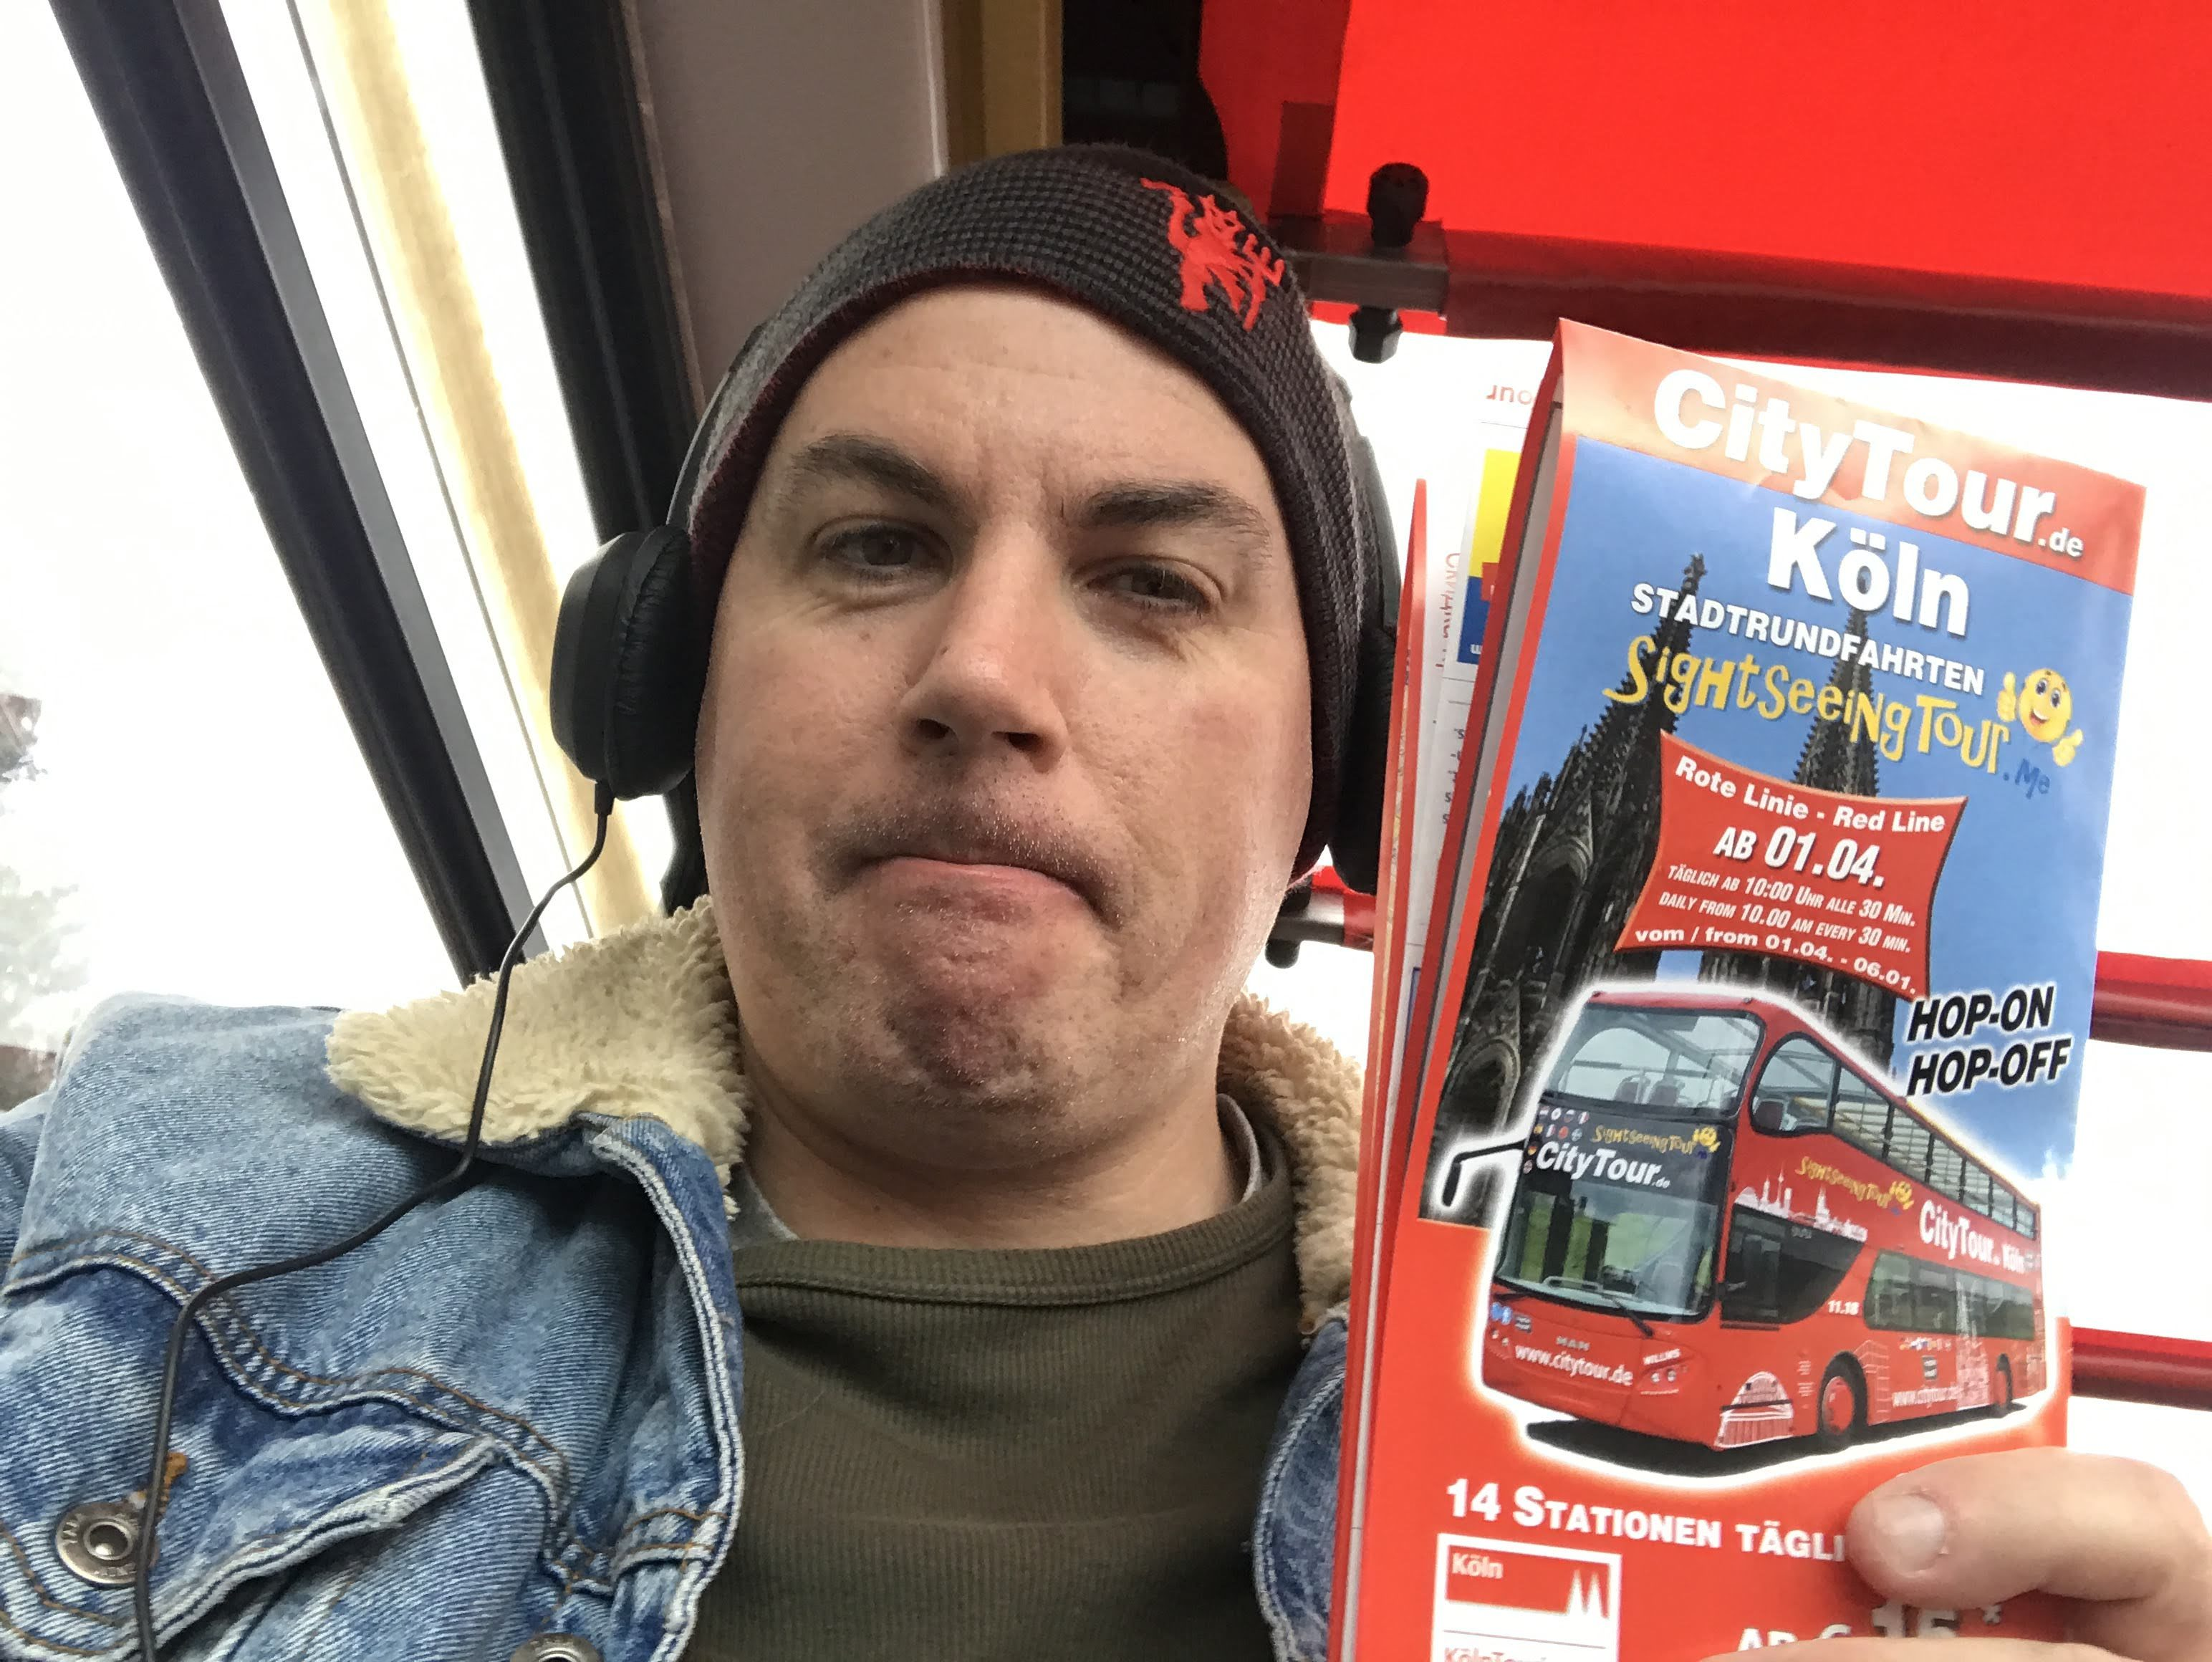 Shane Smyth taking a bus tour through Cologne